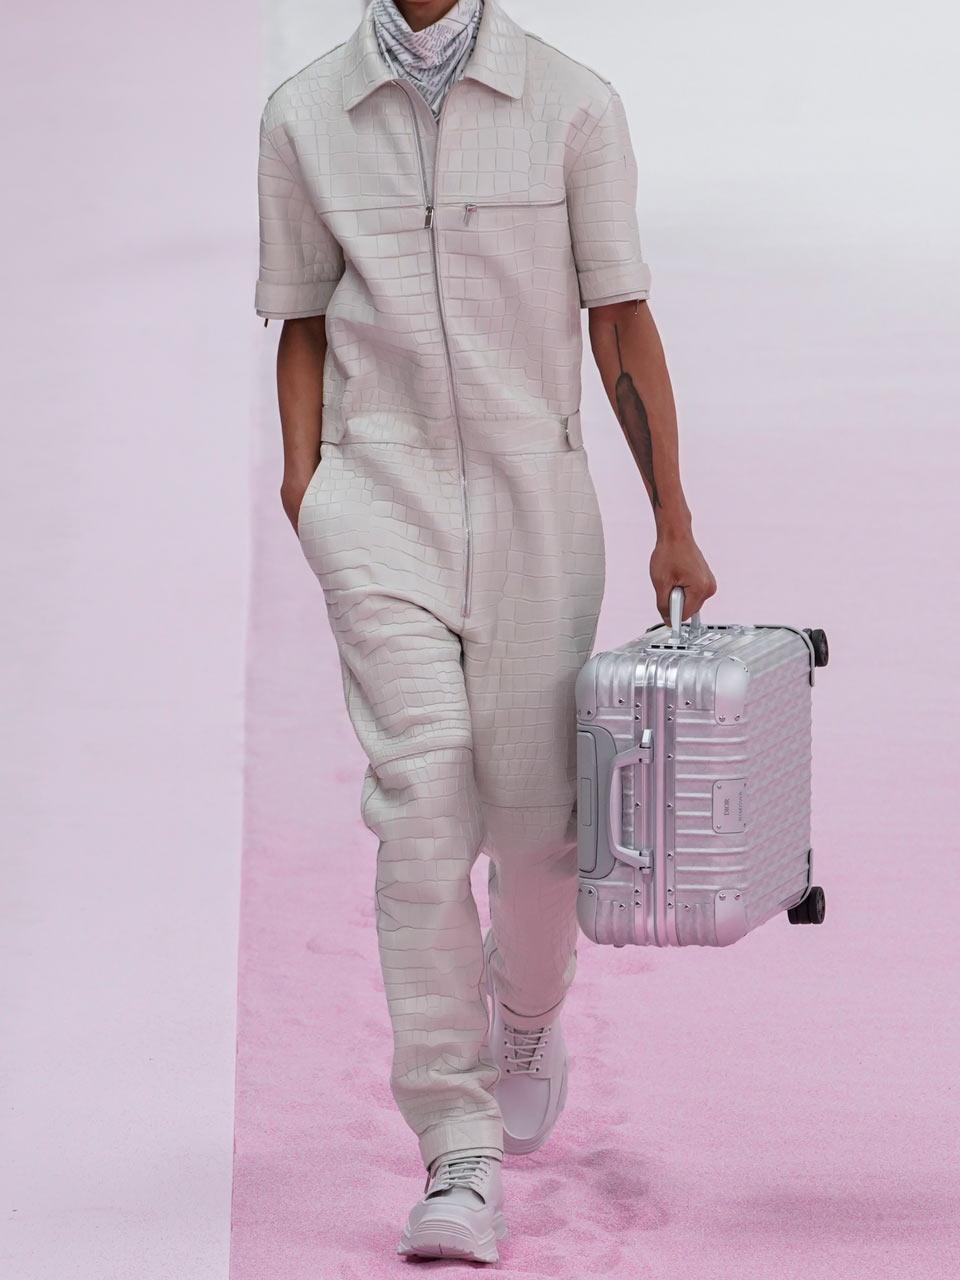 Défilé Dior Men printemps-été 2020.